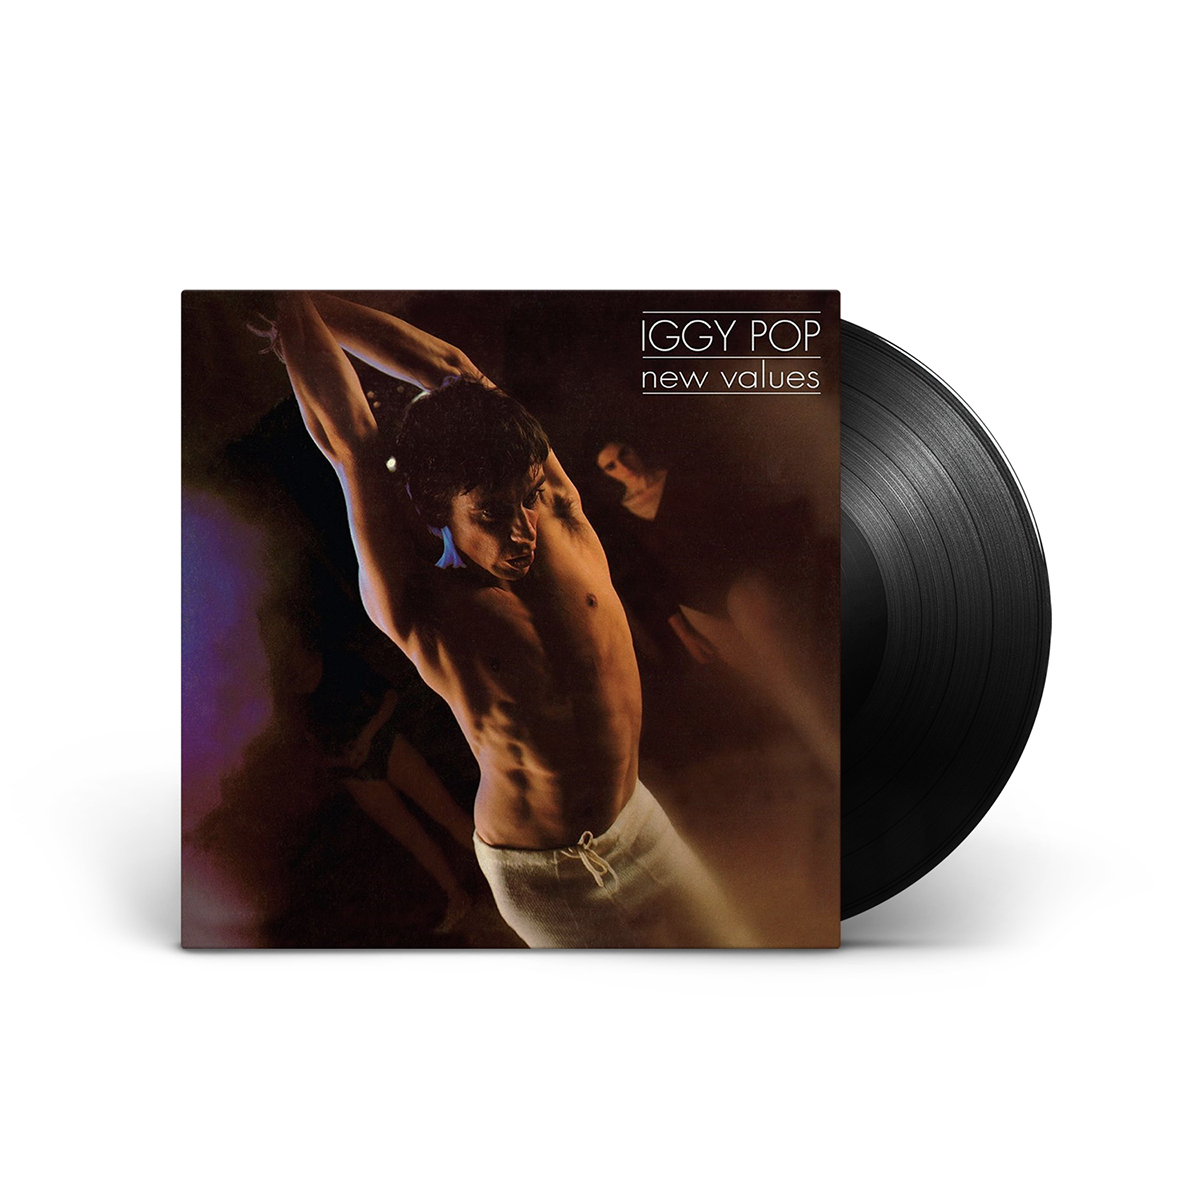 Iggy Pop: New Values Orange 180 Gram Ltd. Anniversary Edition LP